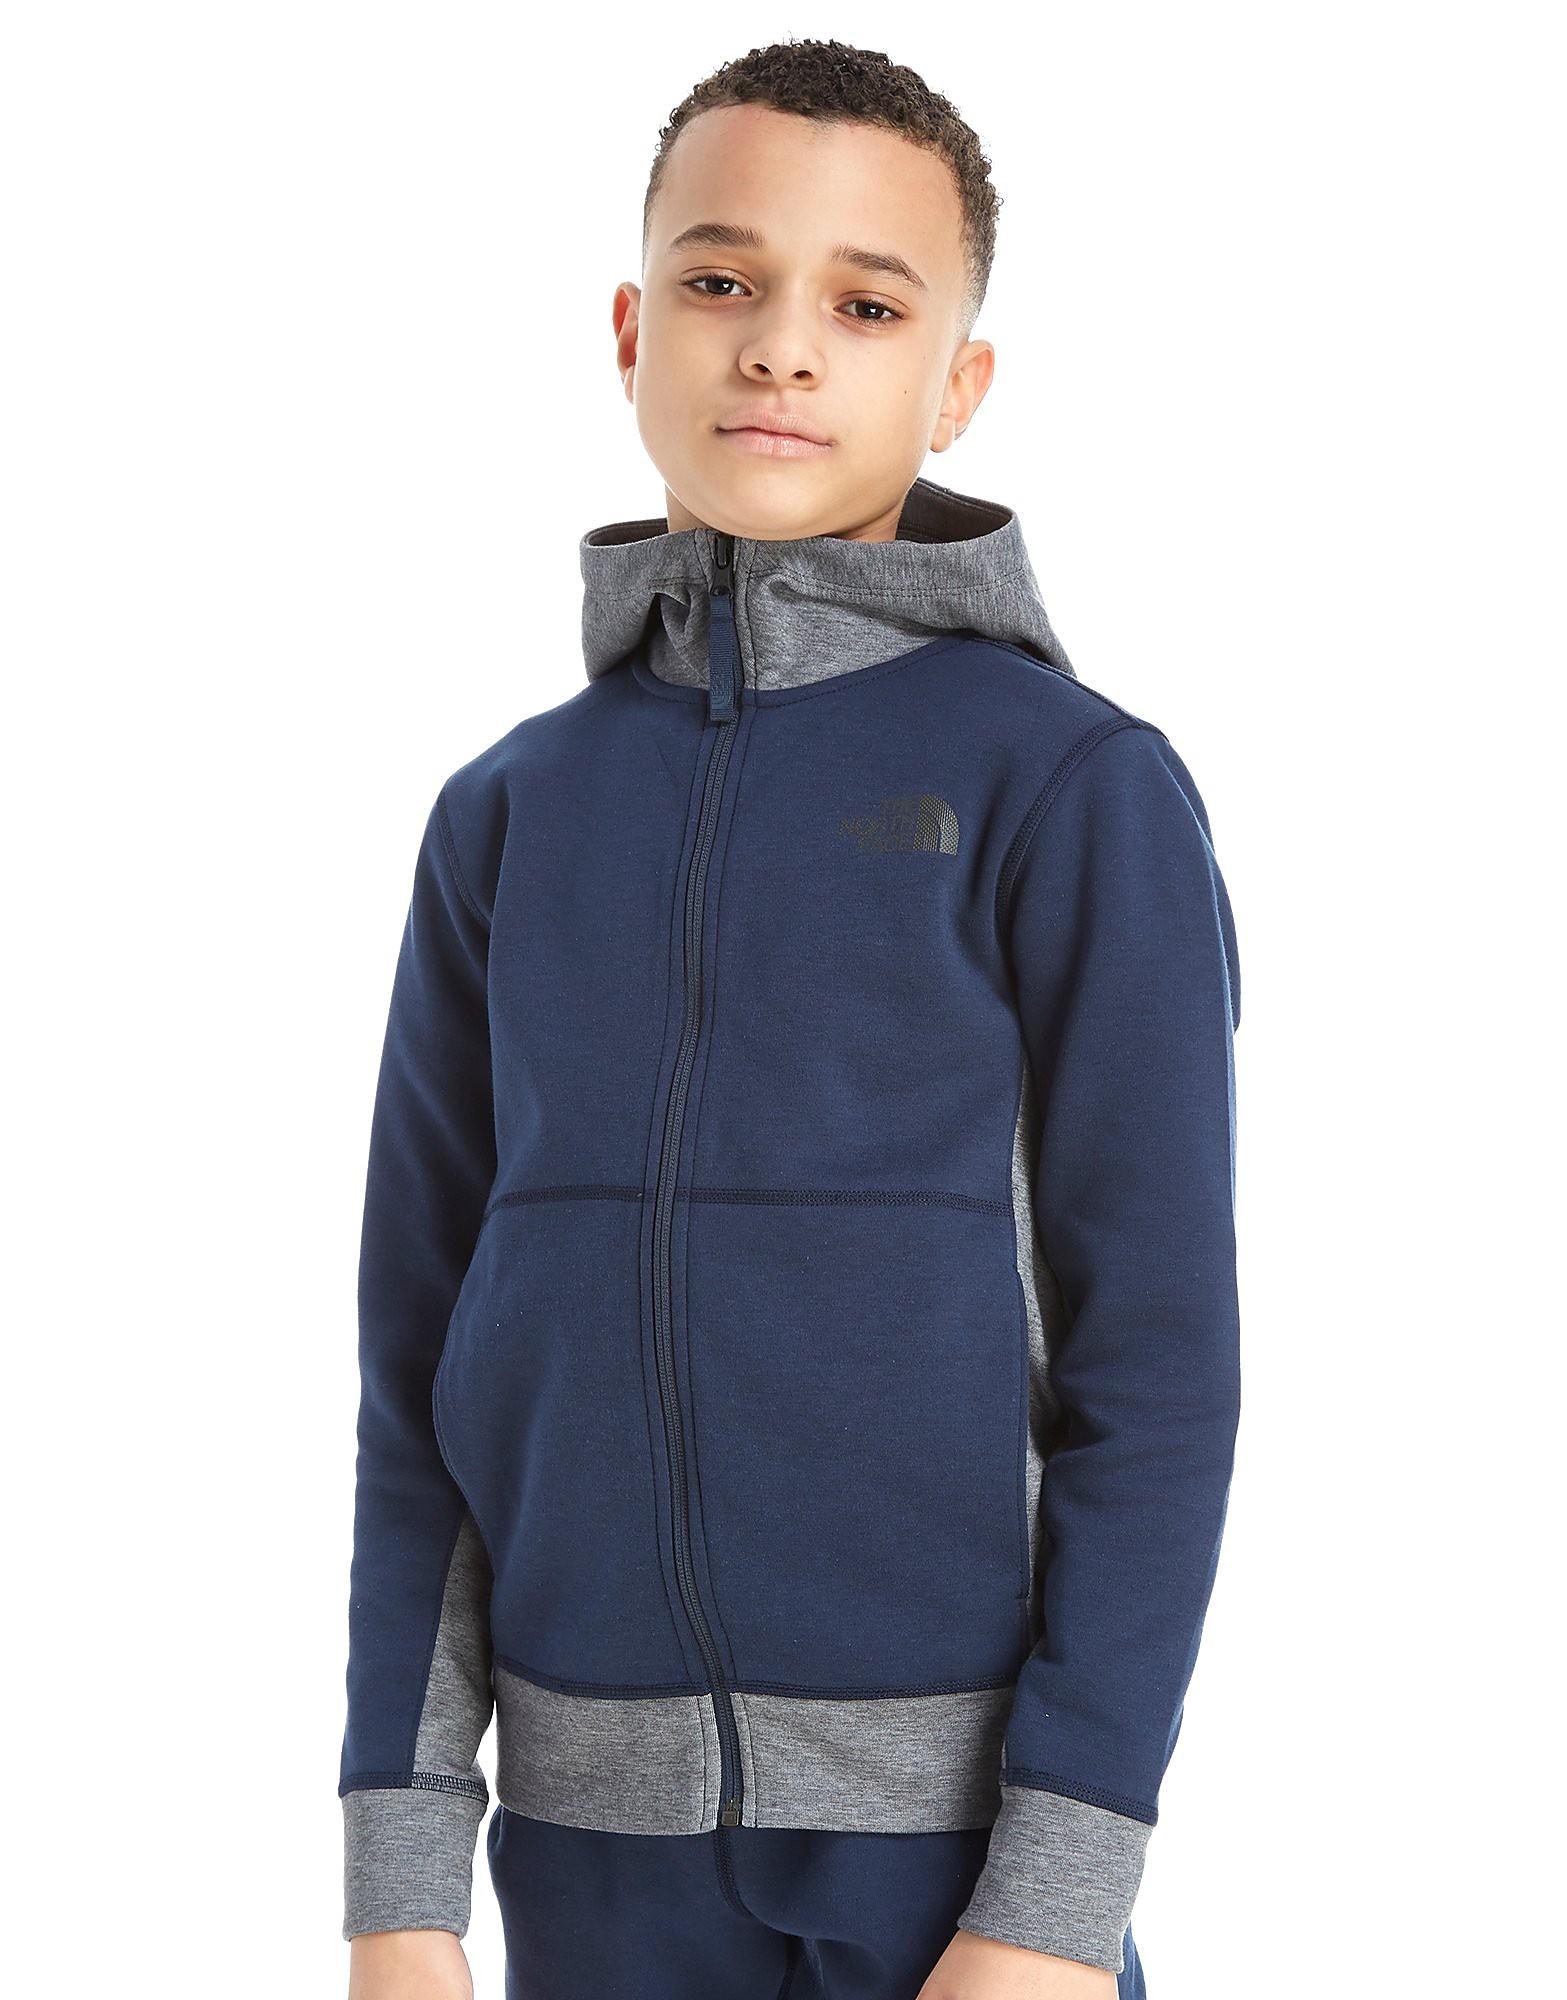 The North Face Slacker Full Zip Hoodie Junior